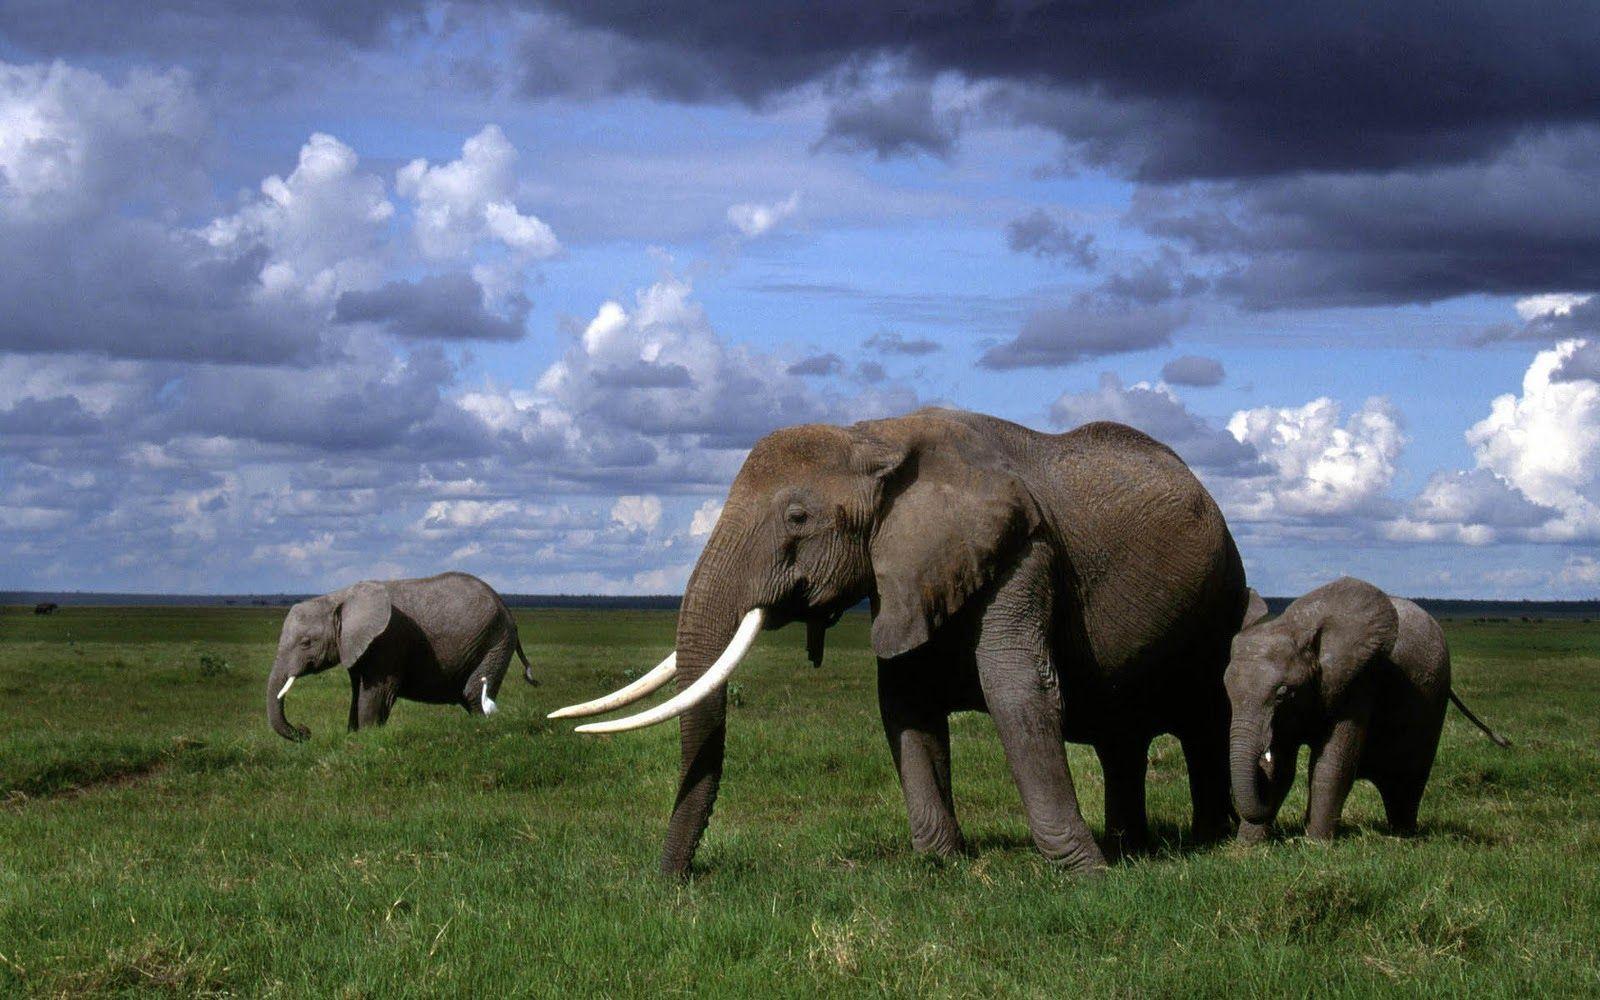 elephant tusk wallpapers animals elephant, animals, elephantelephant tusk wallpapers